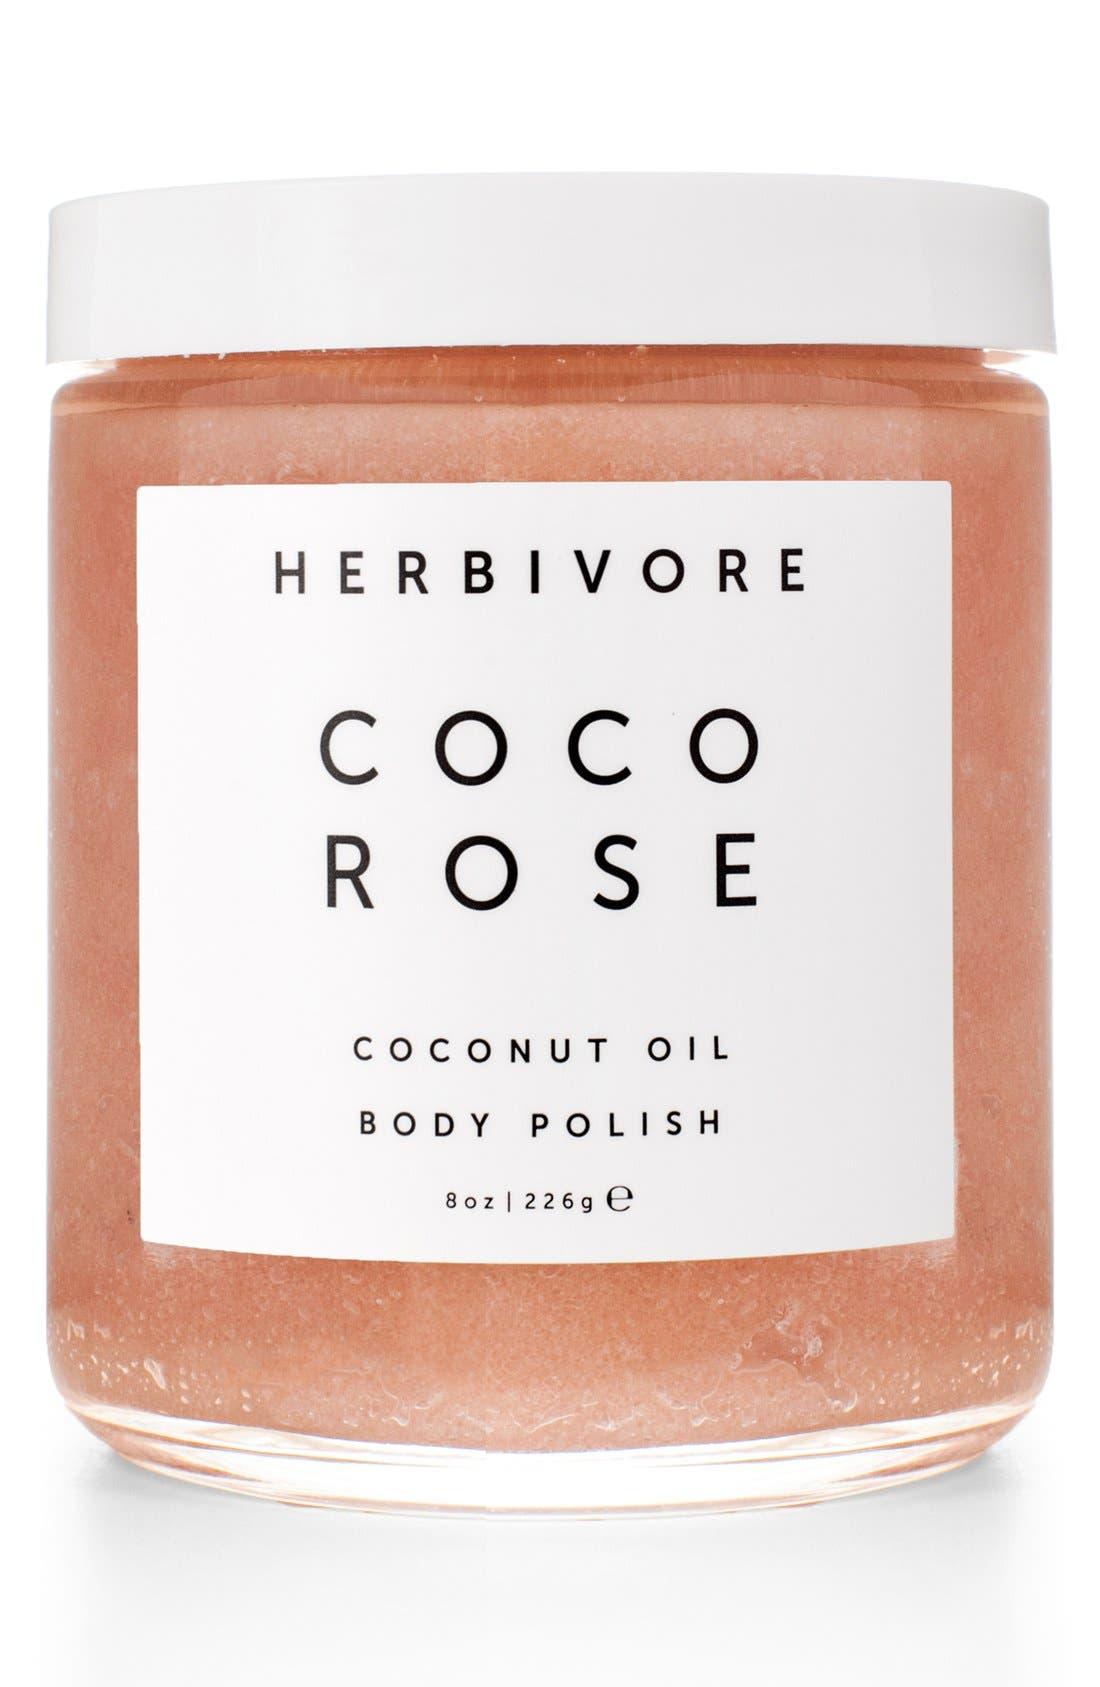 Herbivore Botanicals Coco Rose Coconut Oil Body Polish (8 oz.)